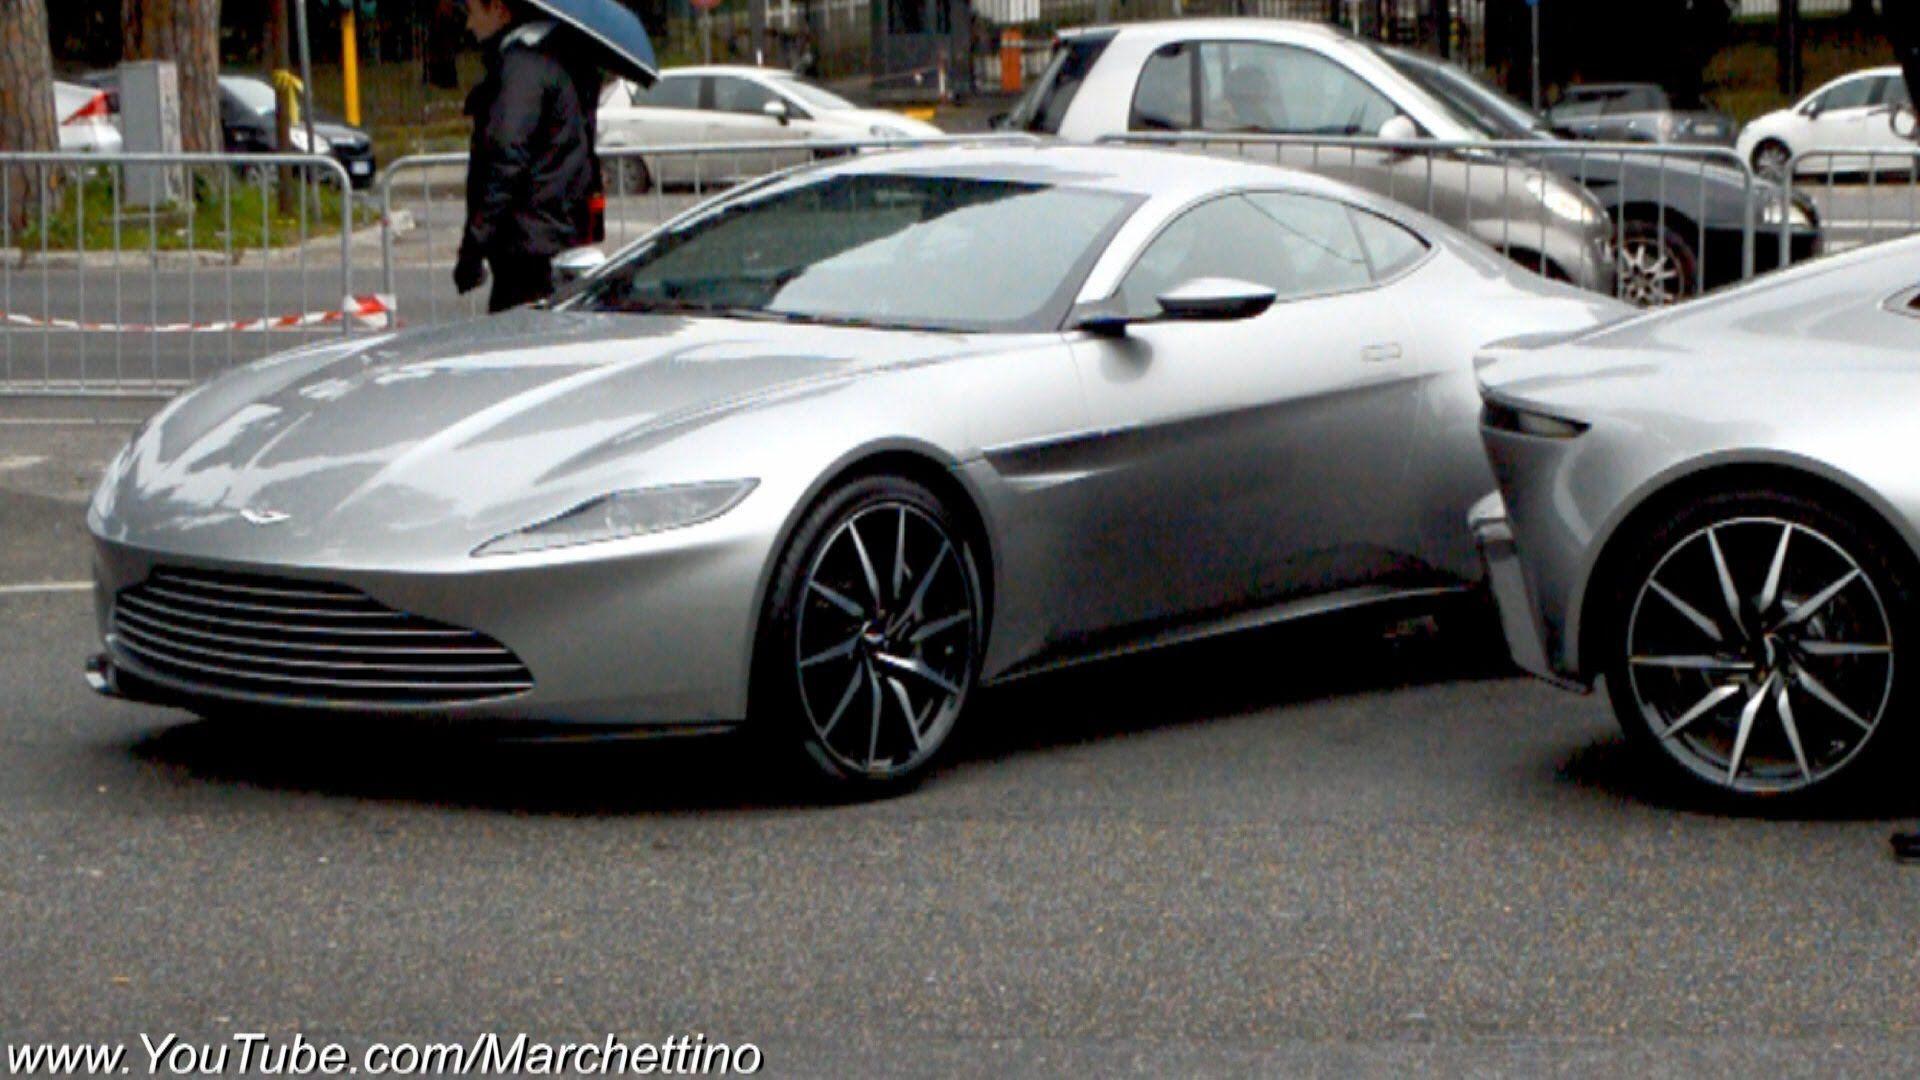 Cars Aston Martin Db10 Filming James Bond 007 Close Call